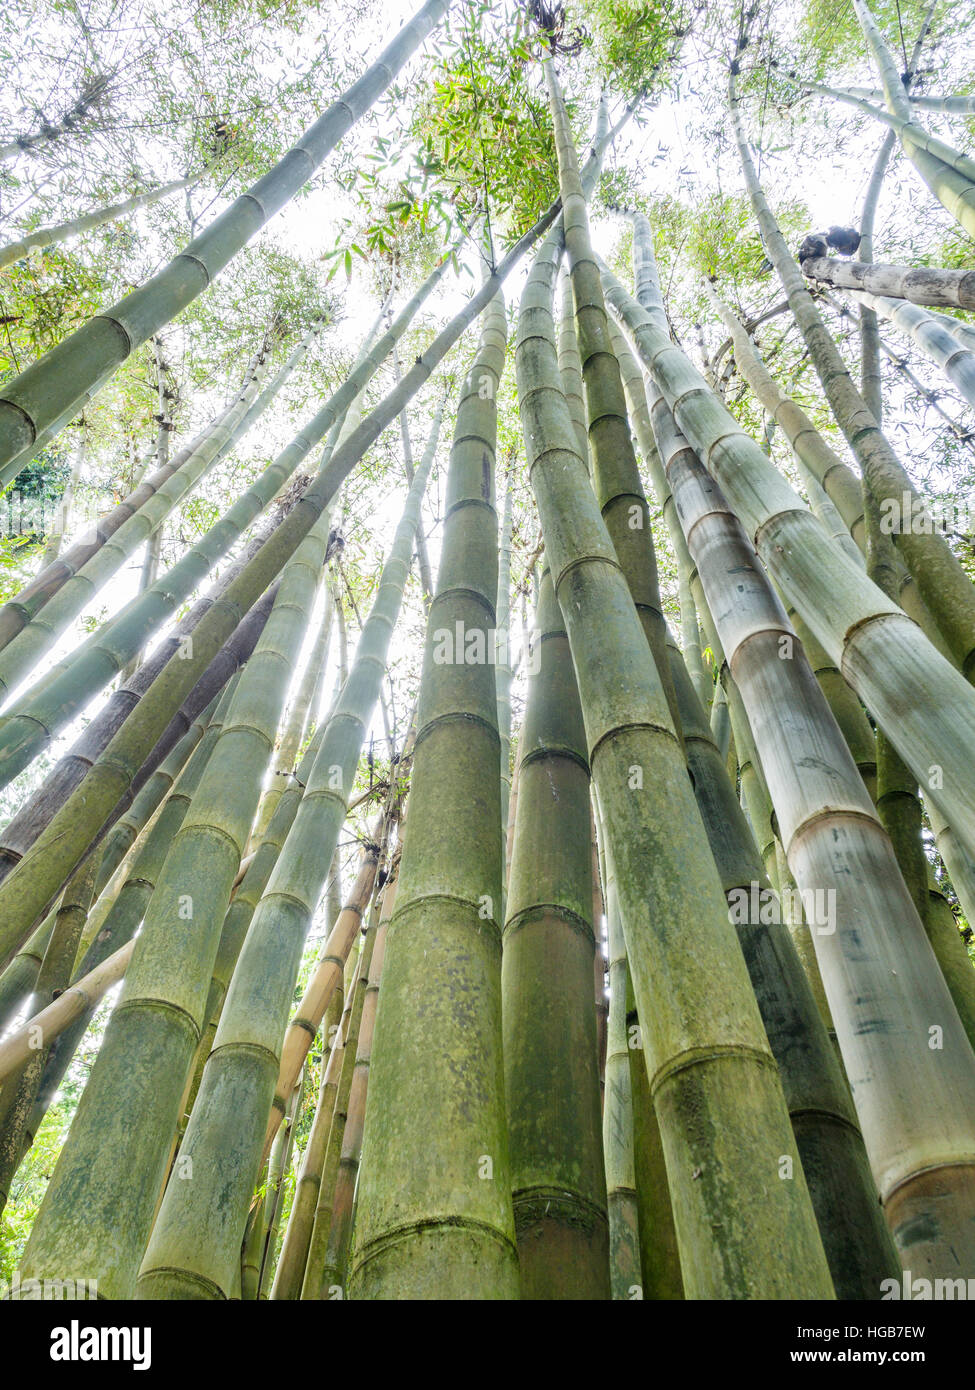 Tall Bamboo Stems Stockfotos & Tall Bamboo Stems Bilder Alamy